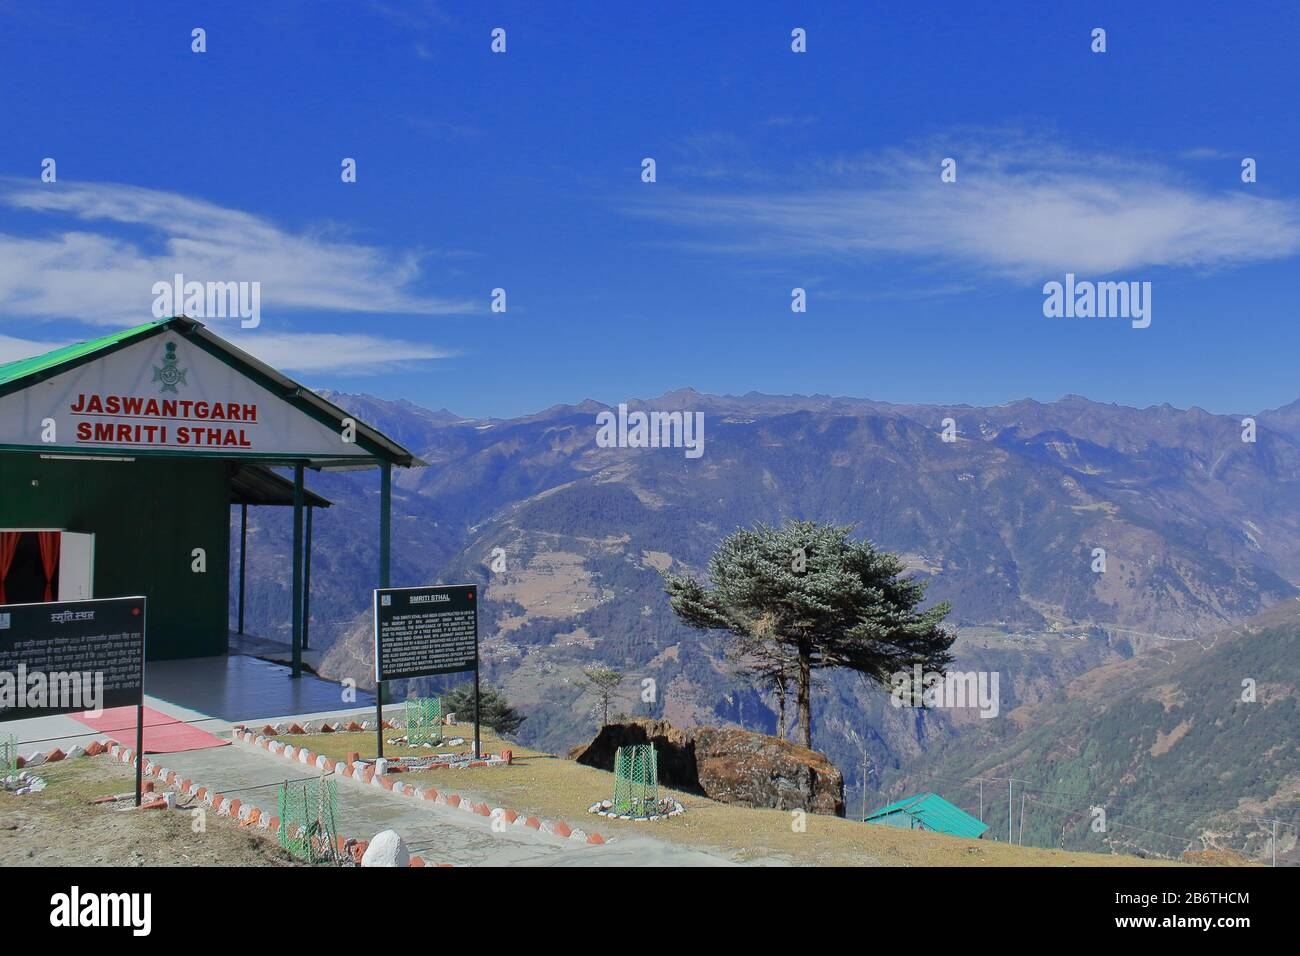 jaswantgarh smriti sthal with alpine landscape. this war memorial is a popular tourist spot in tawang, arunachal pradesh, india Stock Photo